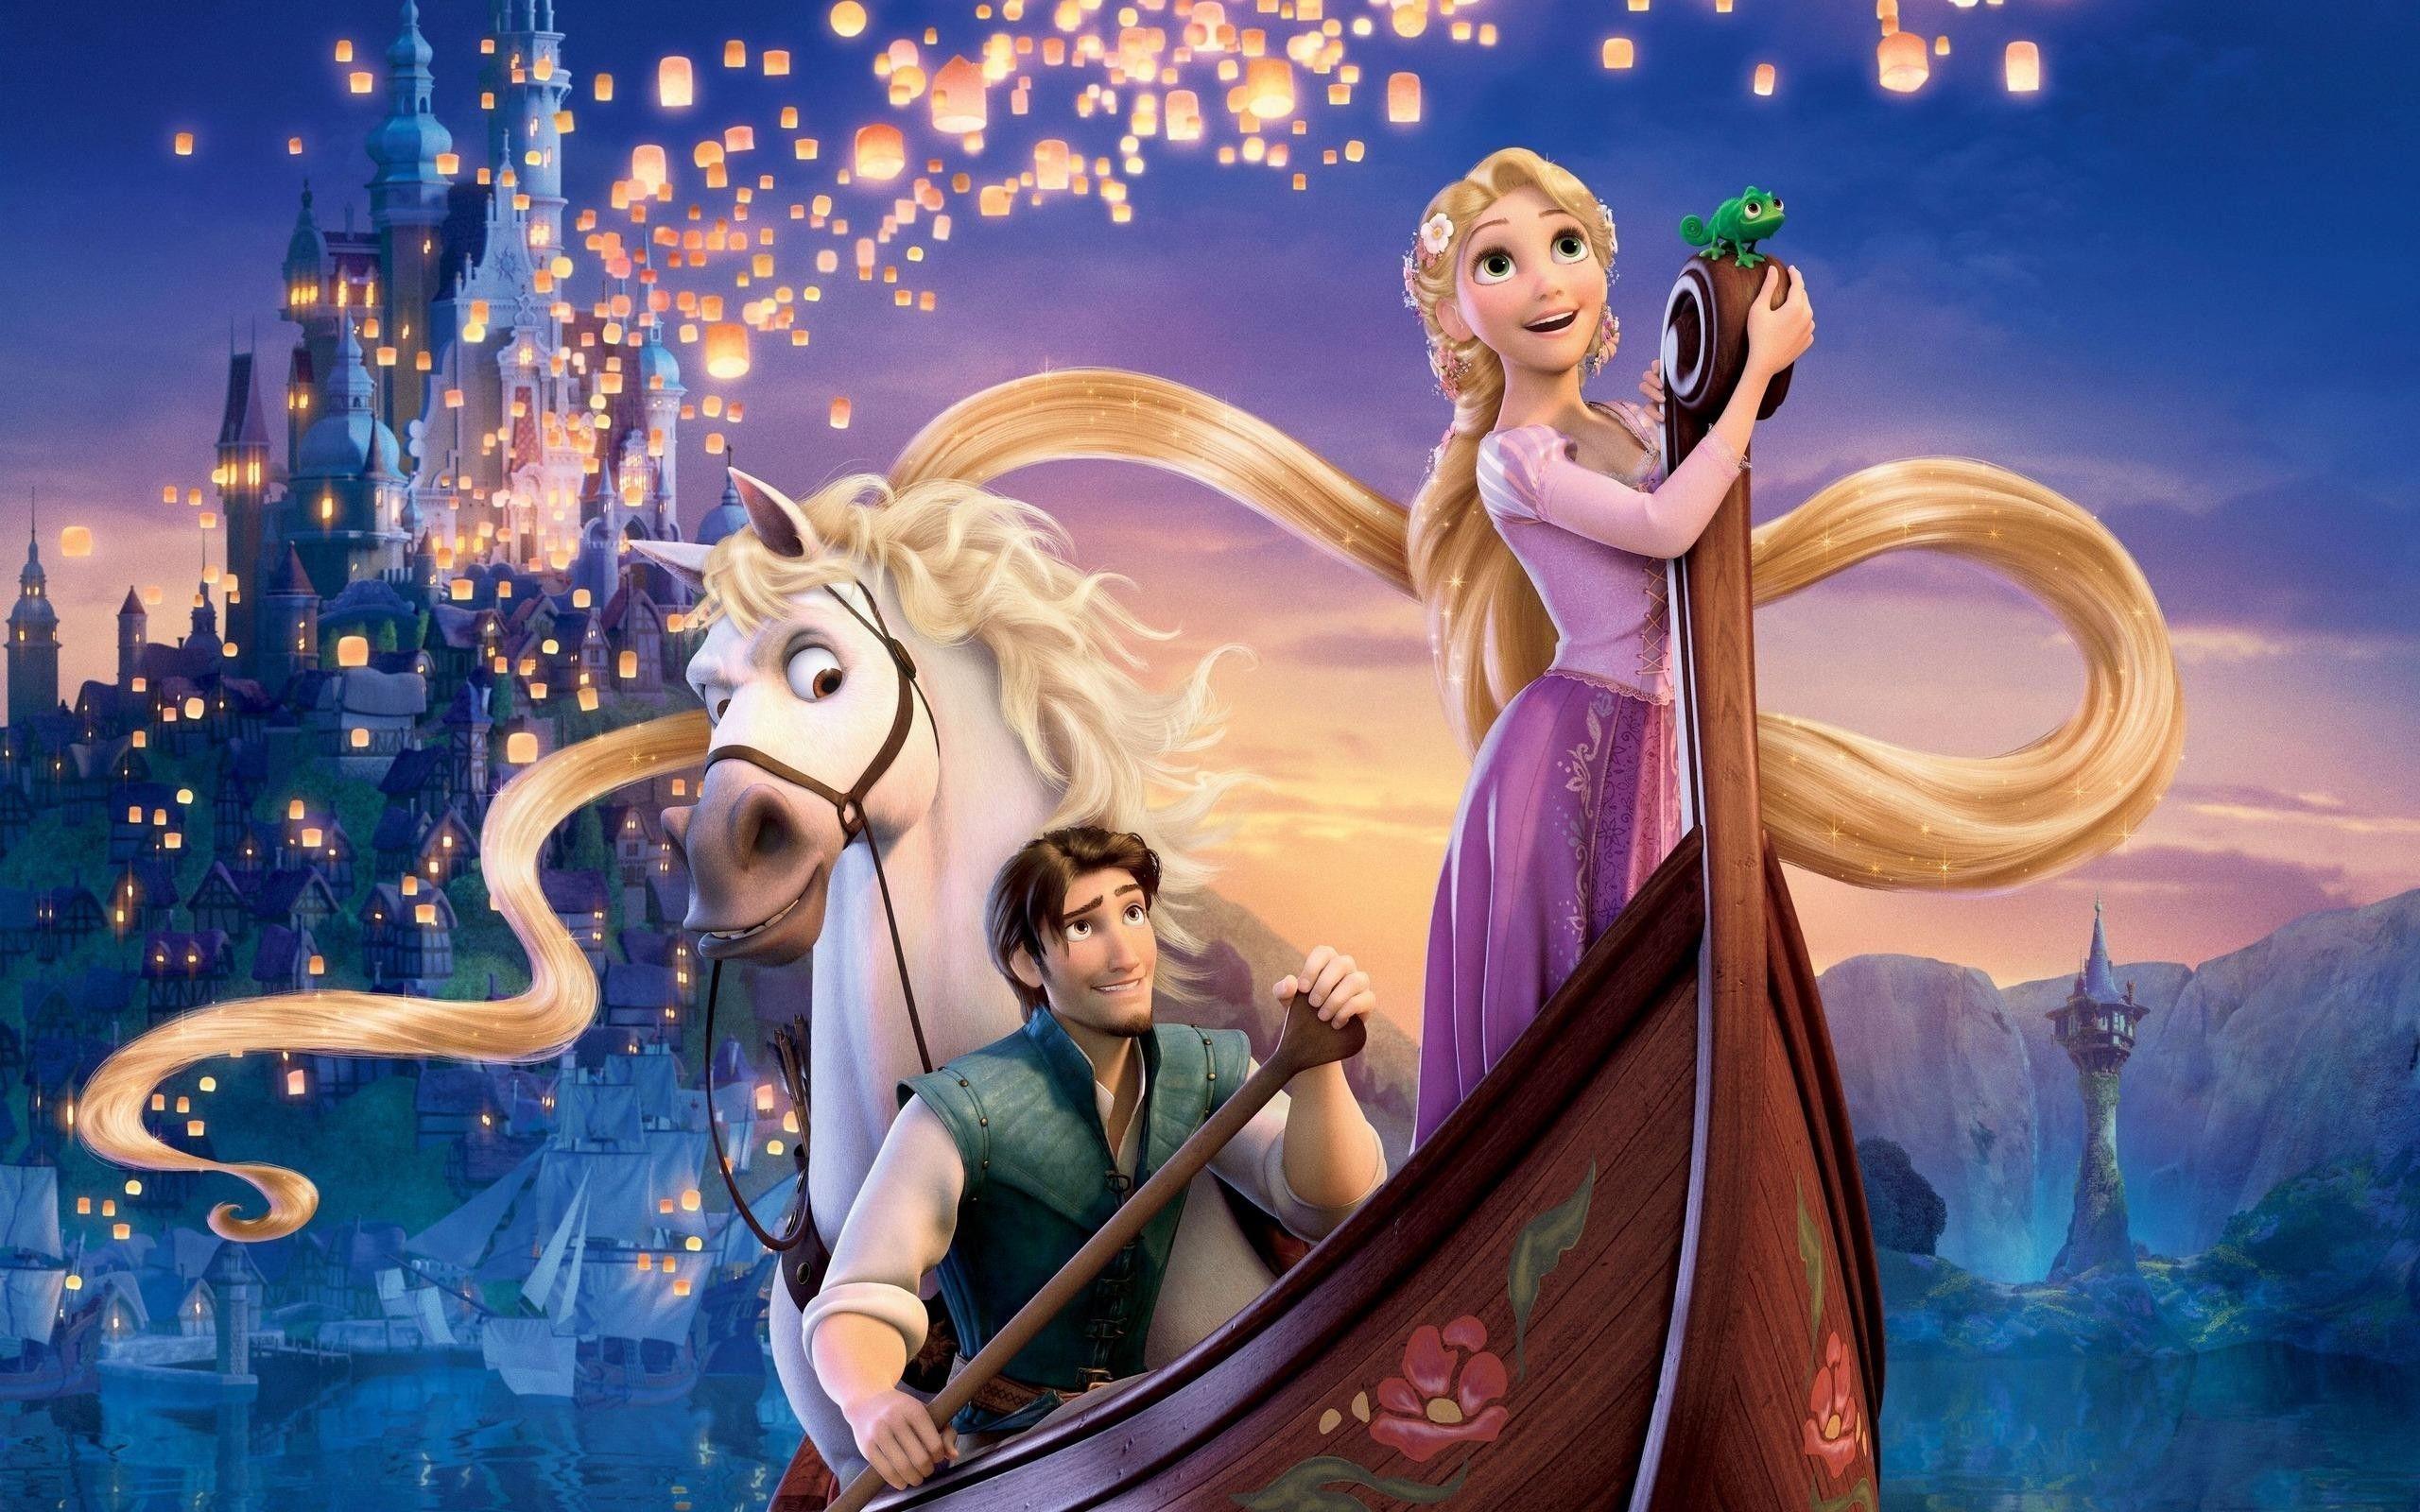 Frozen Filme Completo Dublado Em Portugues Papel De Parede Congelado Filme Frozen Frozen Disney